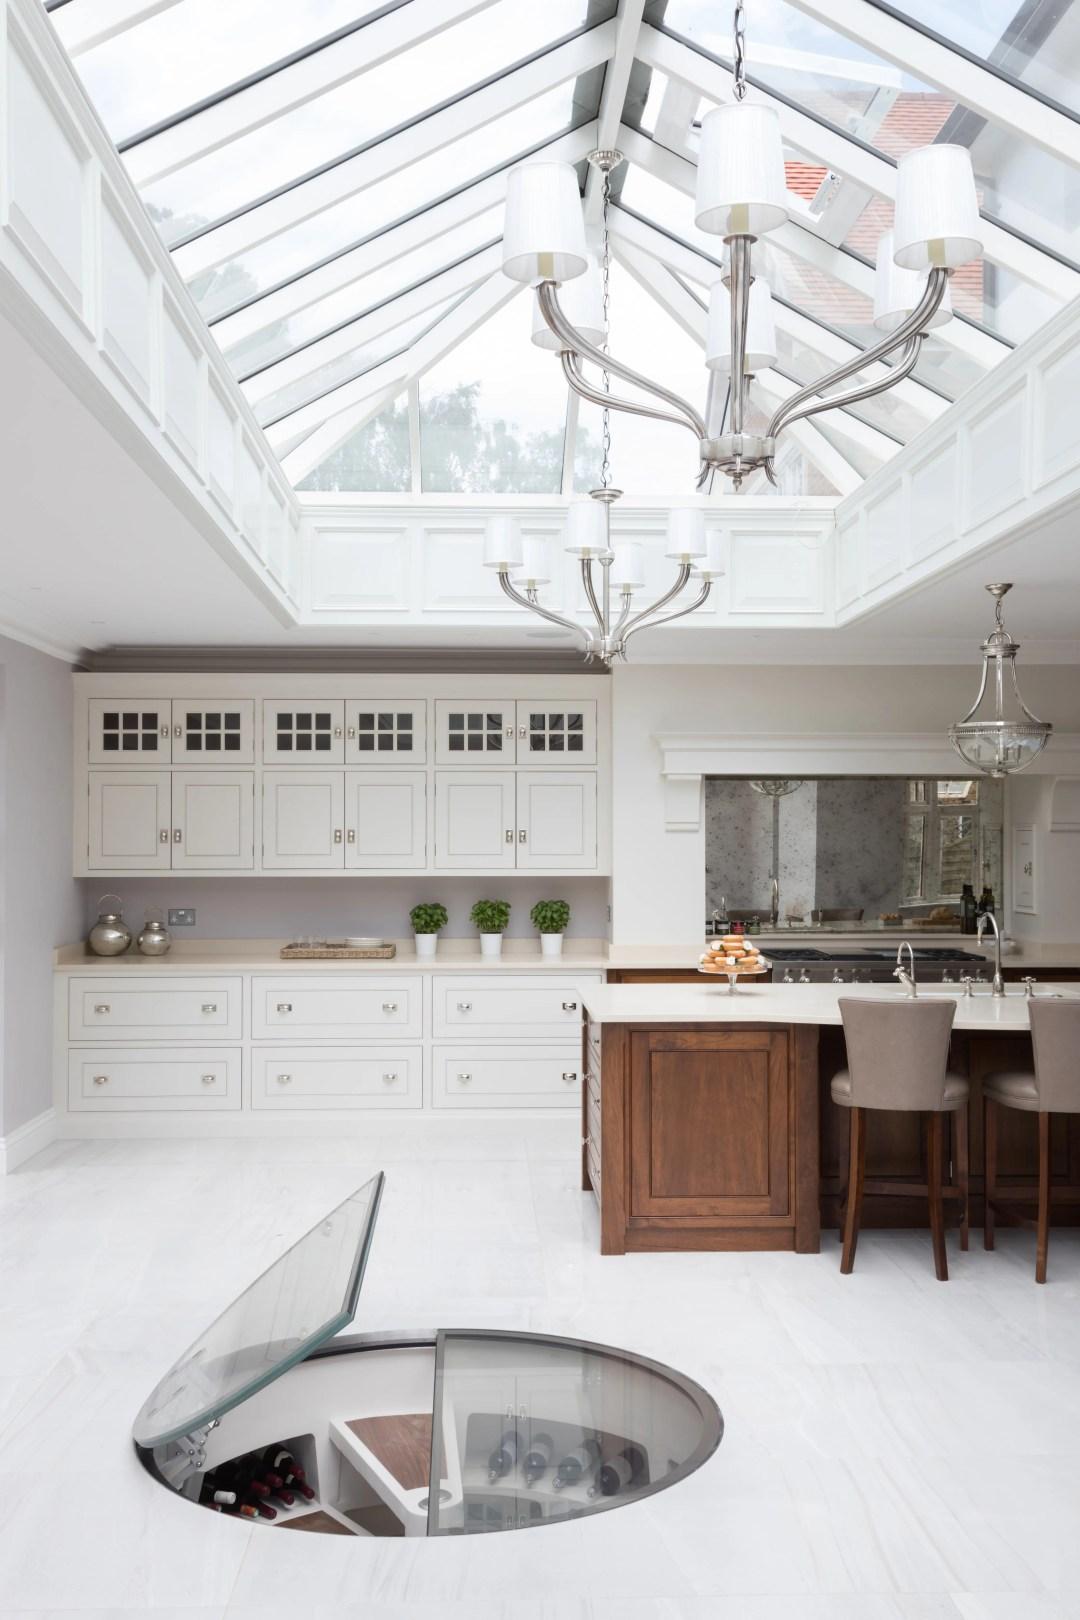 Wilton House - Luxury Painted Kitchen Brentwood - Humphrey Munson 24